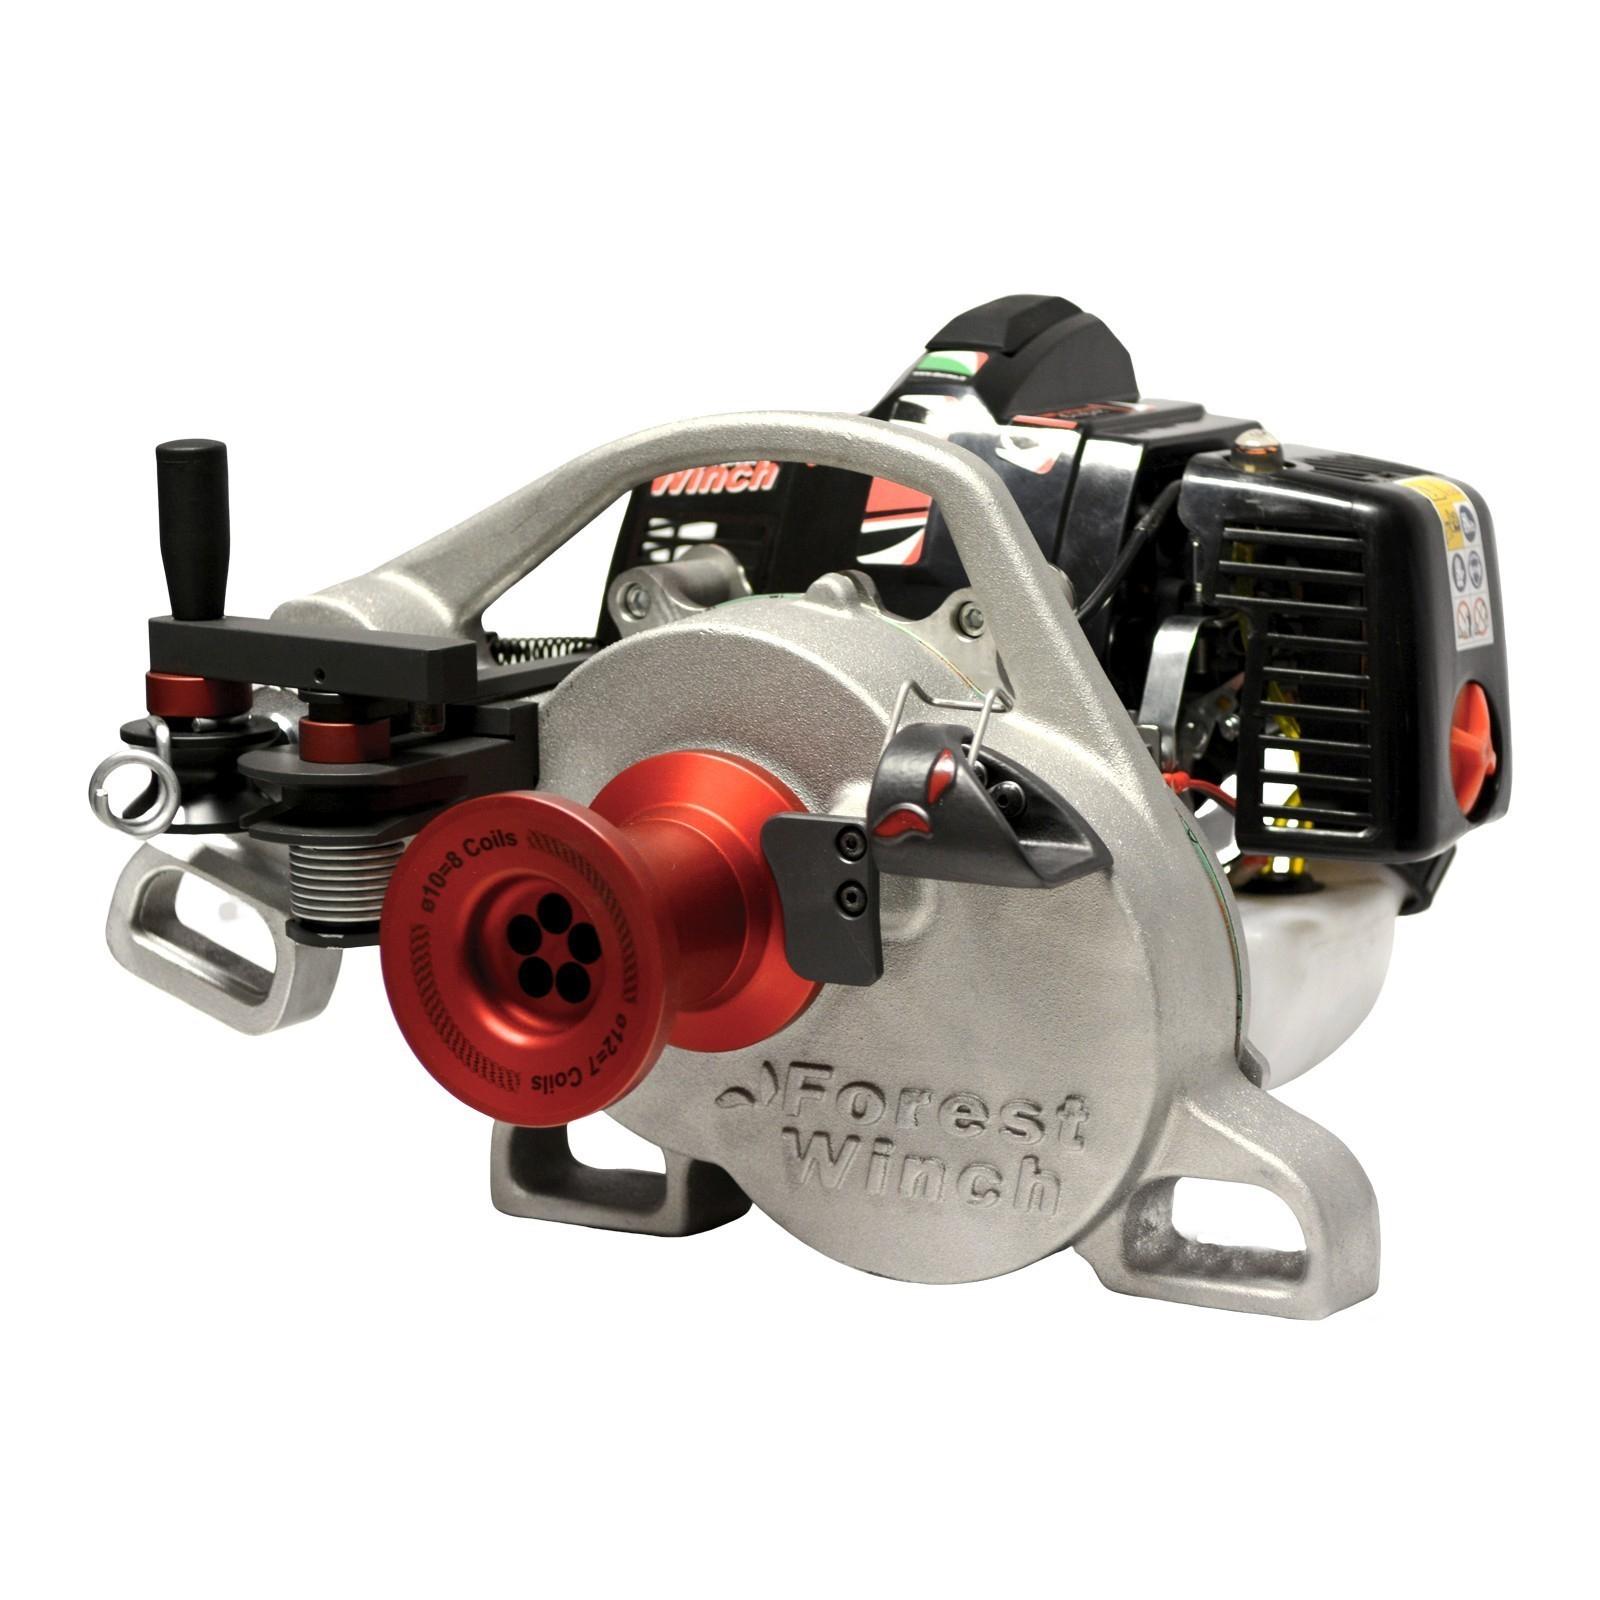 ARGANO FORESTALE DOCMA VF105 RED IRON  815 Kg - MOTORE A SCOPPIO 50cc 2t